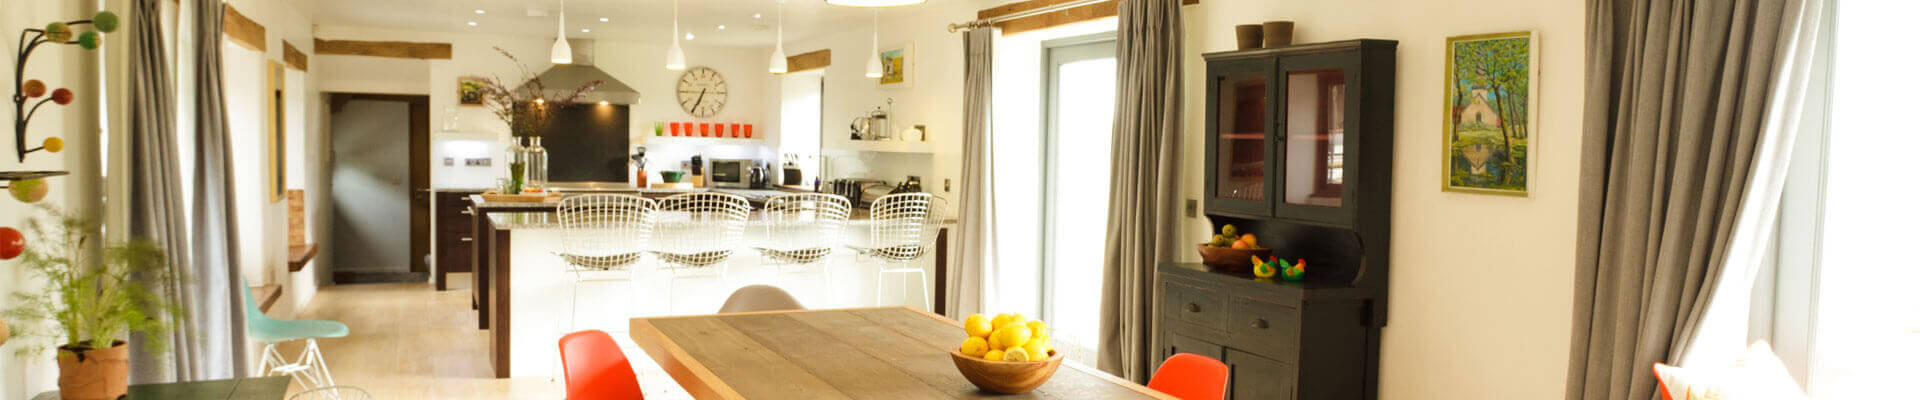 Photo of Tregulland Retreats kitchen